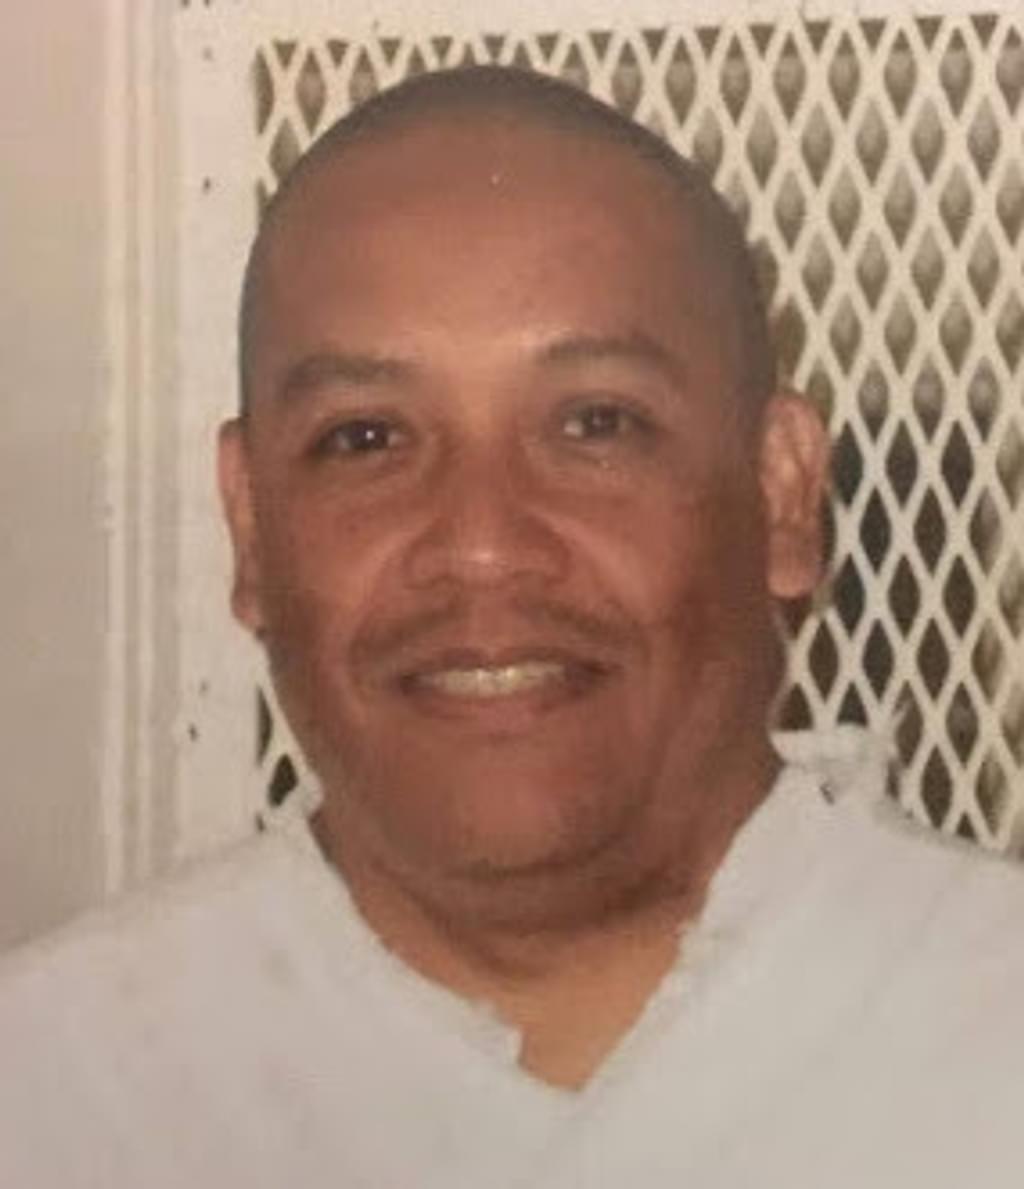 News Brief — Texas Court of Criminal Appeals Stays Third Execution Amidst Coronavirus Concerns